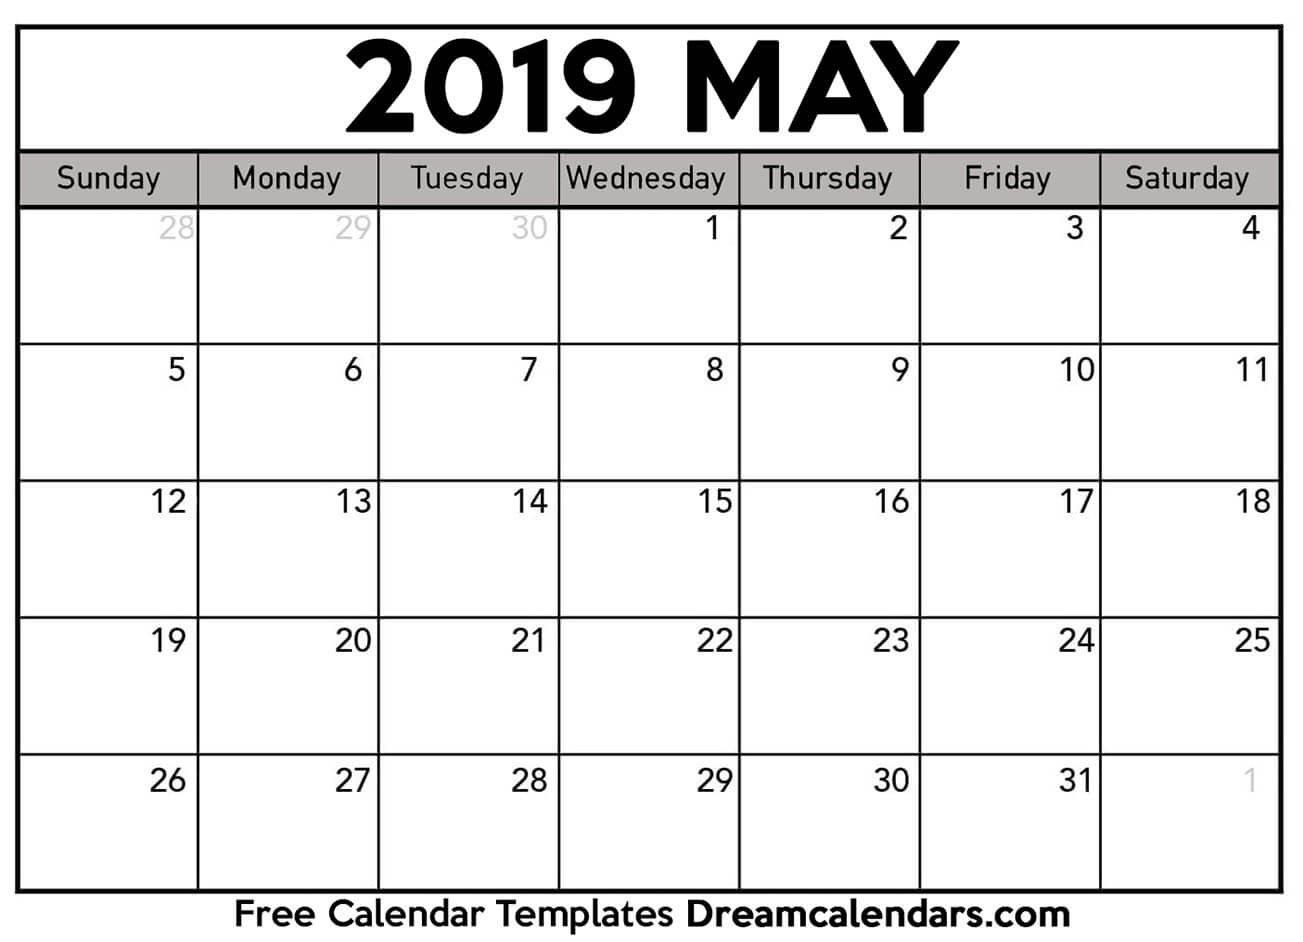 Printable May 2019 Calendar Calendar 0F 2019